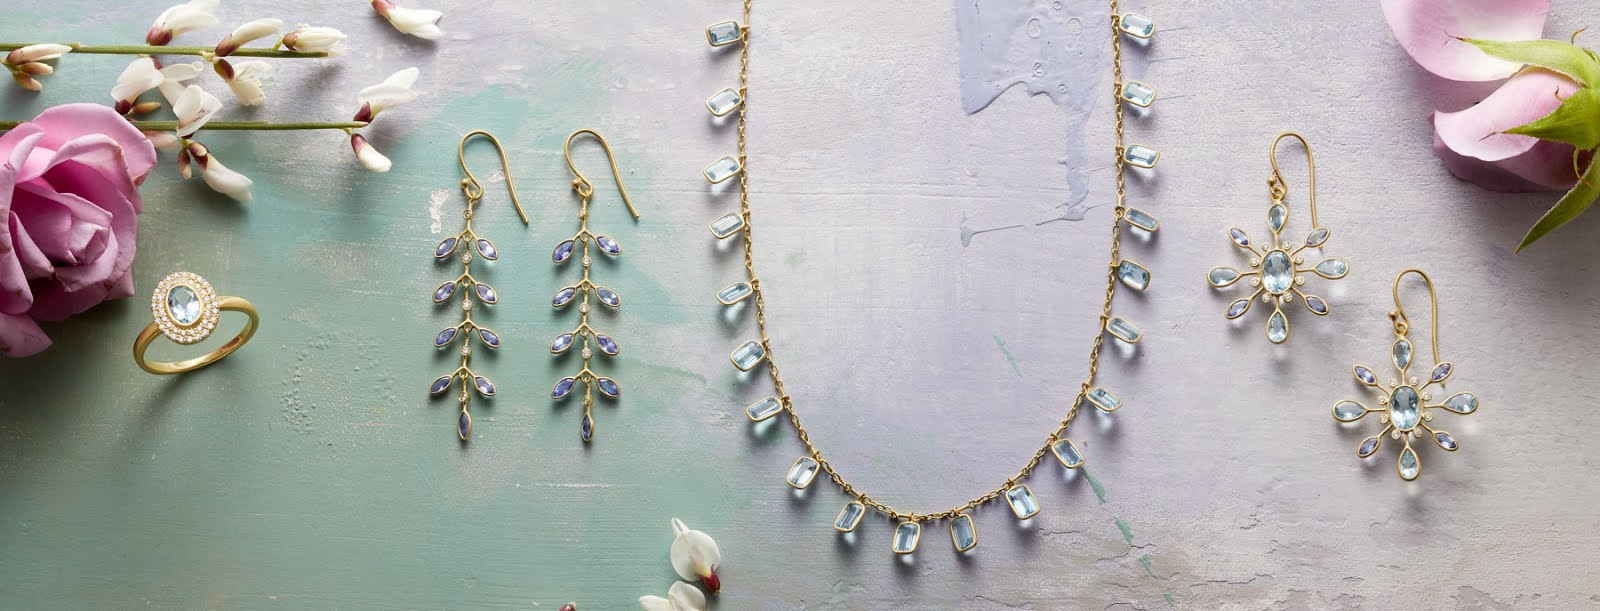 Tej Kothari Sundance Catalog Jewelry Artist